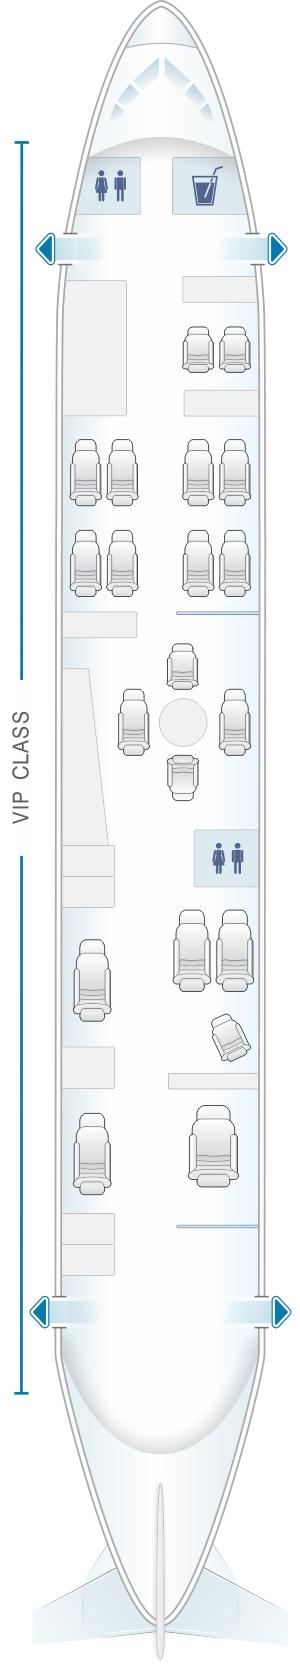 Seat map for White Airways Airbus A319 CS TQJ night configuration